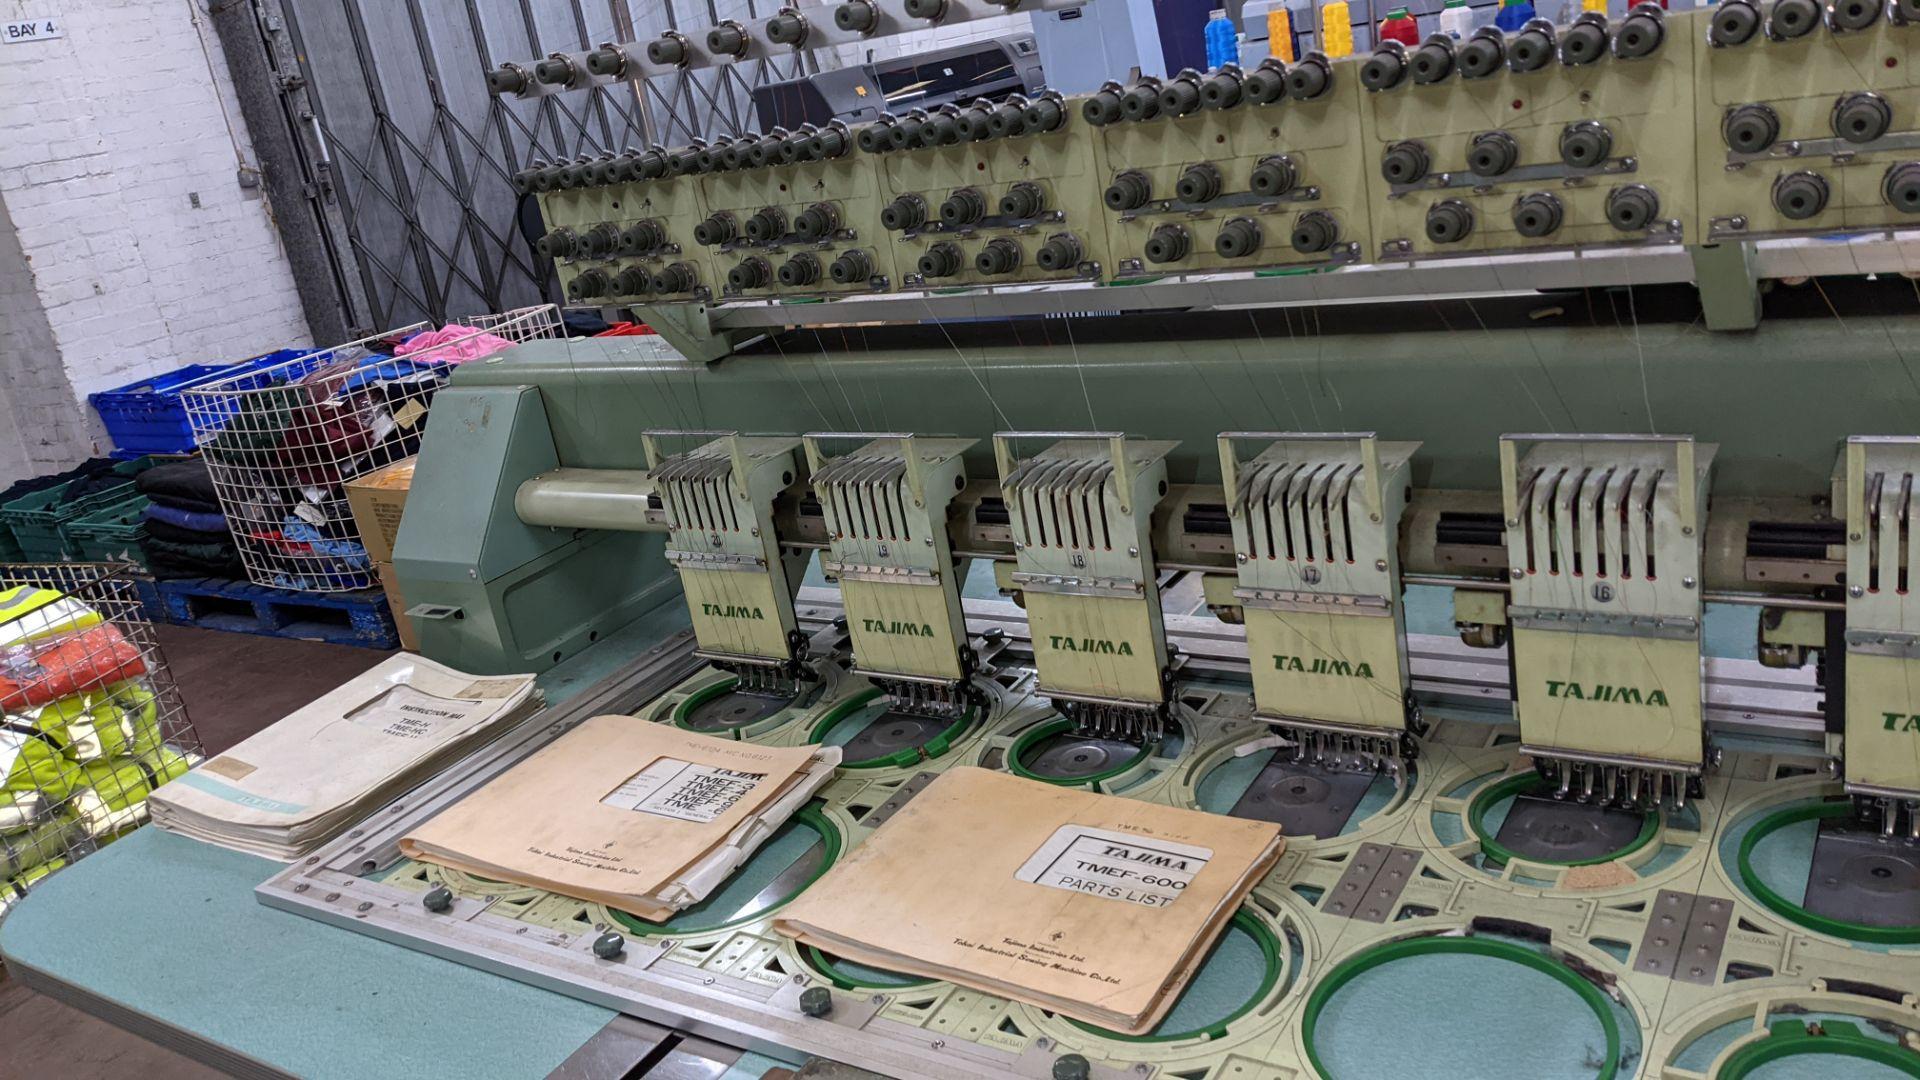 Tokai Tajima electronic 20 head automatic embroidery machine model TMEF-H620 - Image 11 of 25